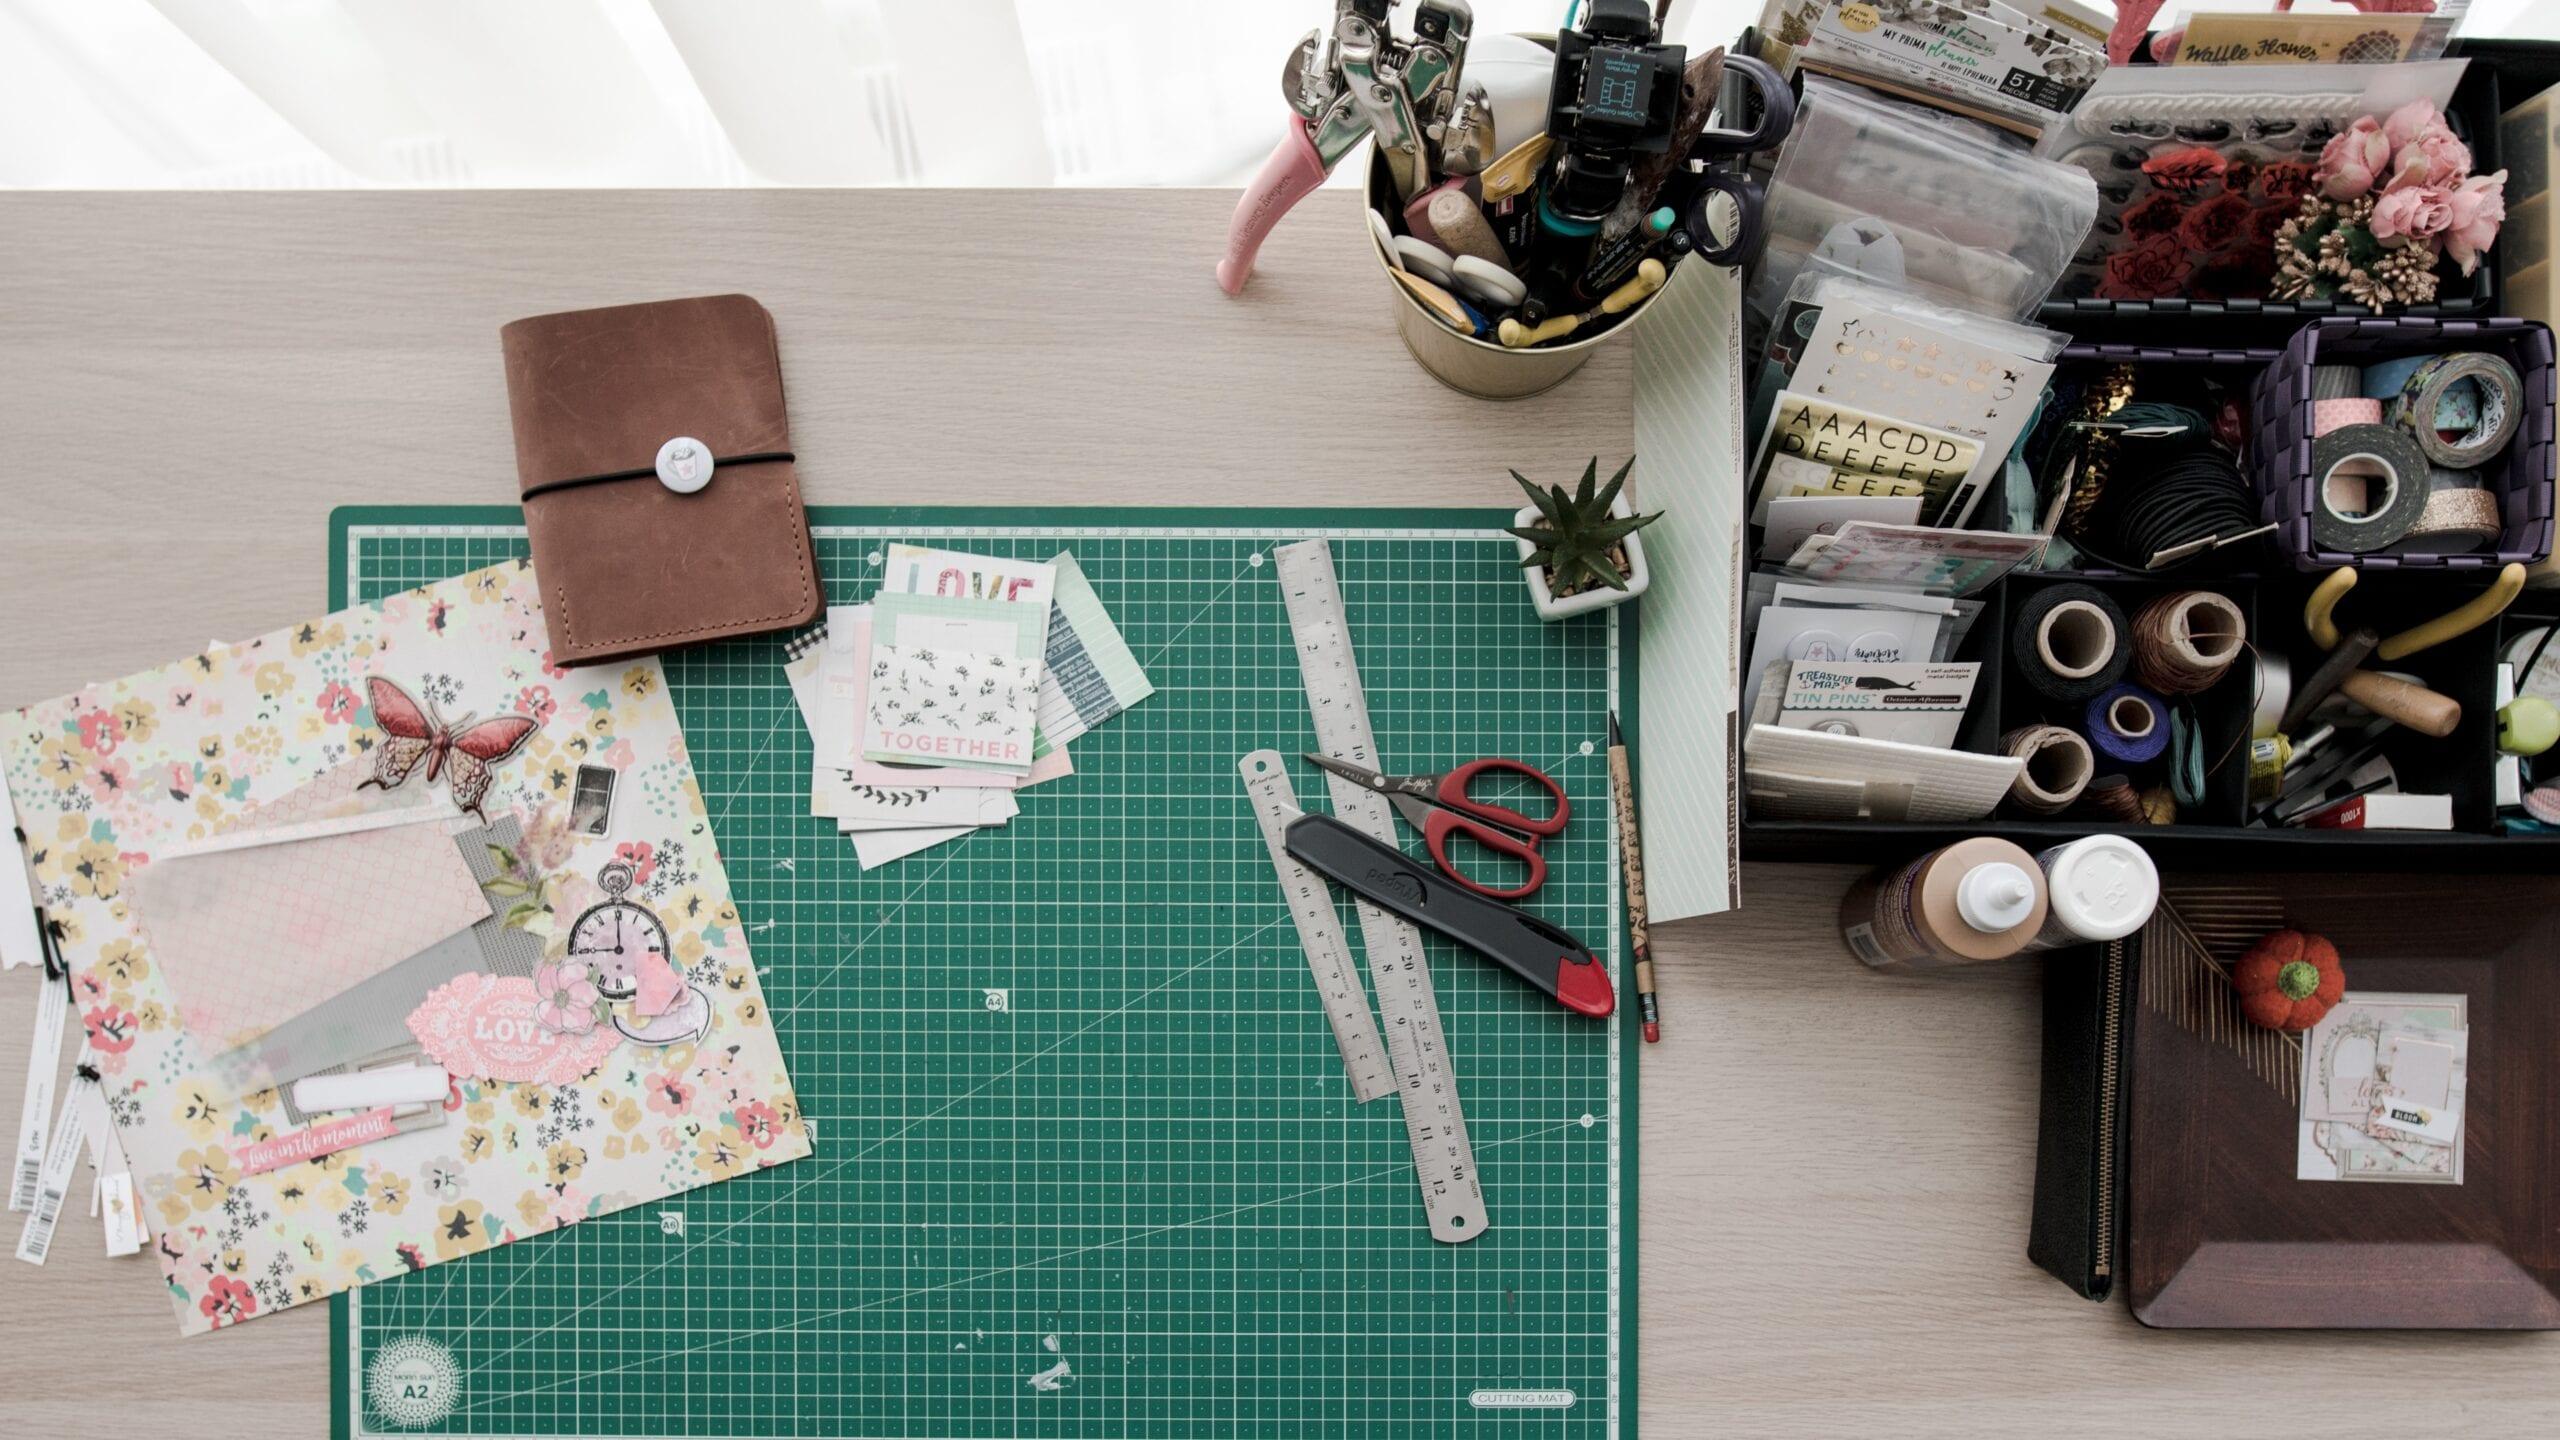 cutting mat and design materials